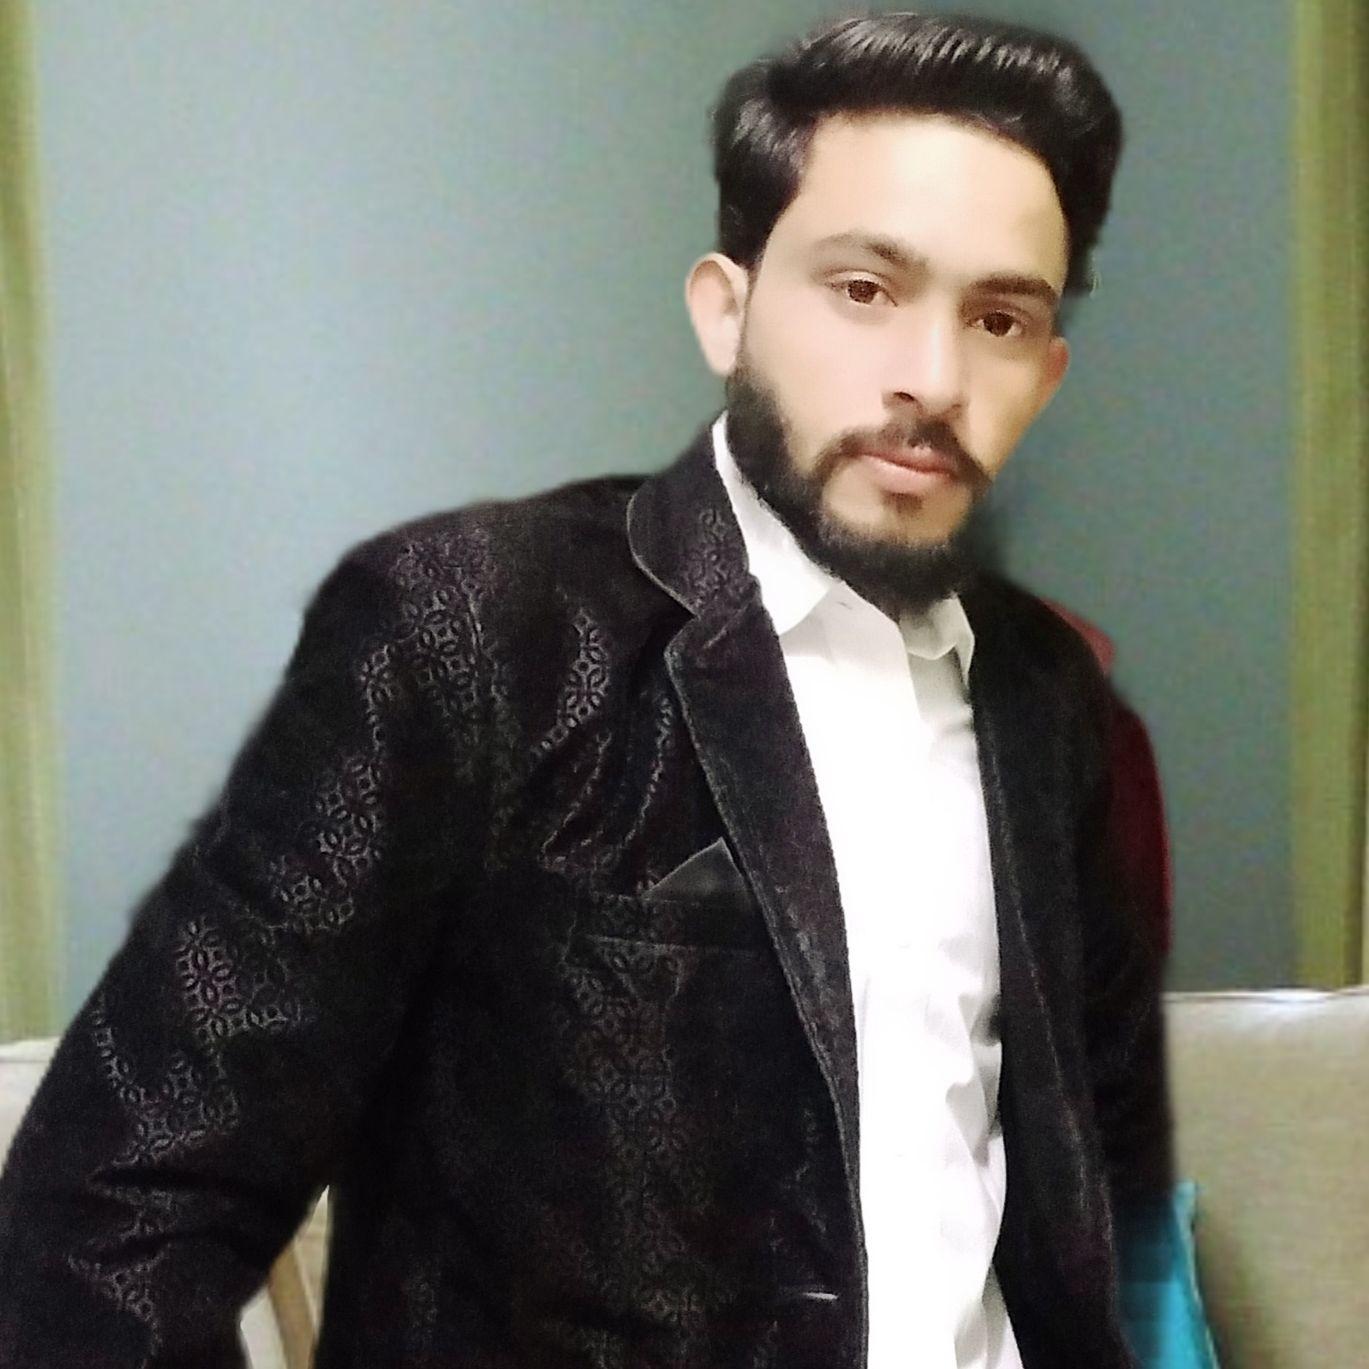 Ishwar Lal Verma